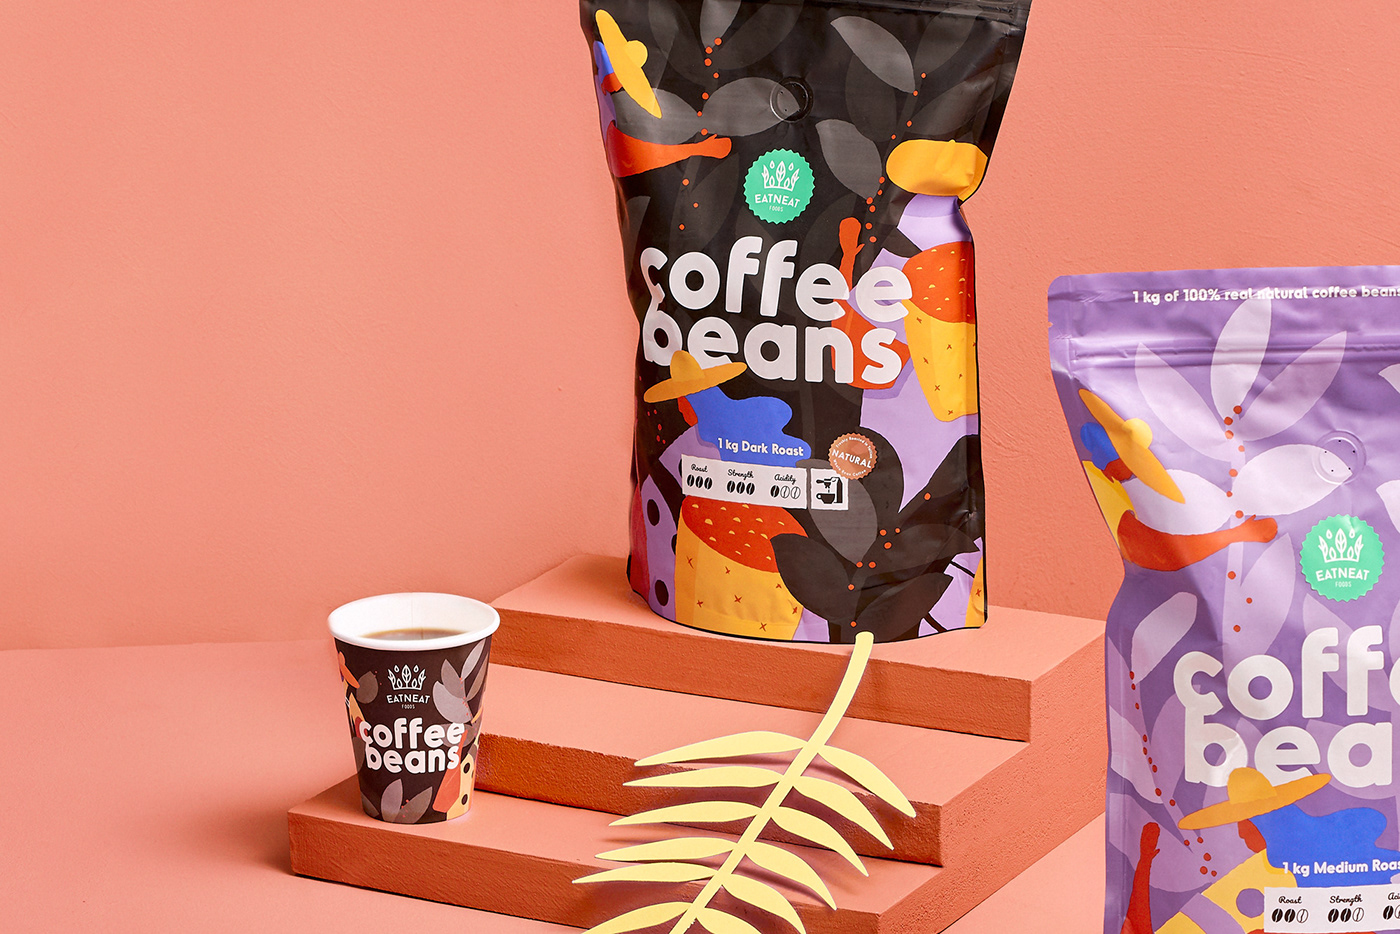 Estonia Coffee Packaging Food  design ILLUSTRATION  beverage branding  hmmm creative Lovely Package